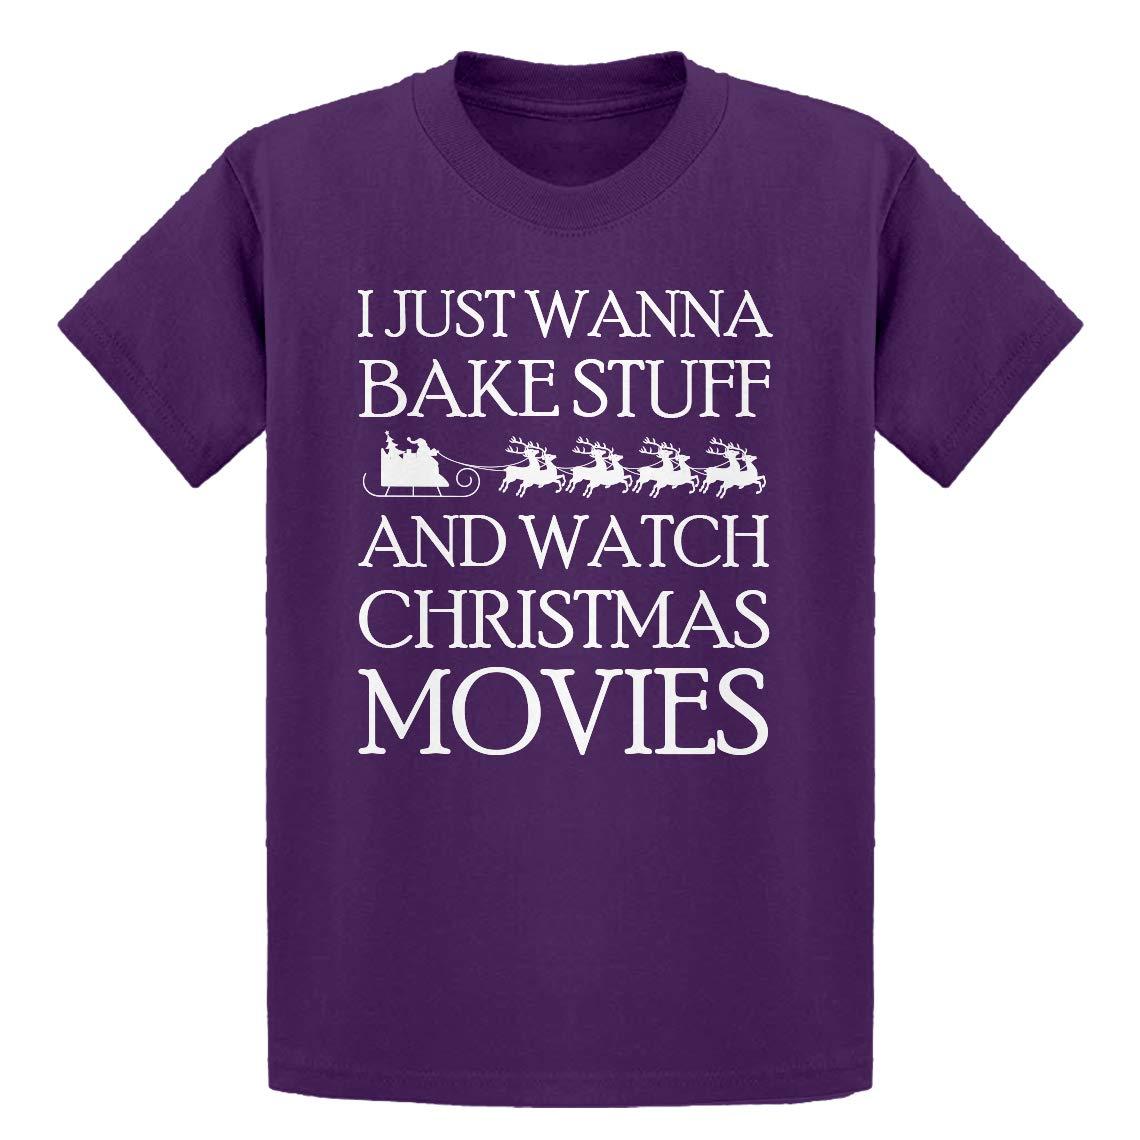 Bake Stuff Christmas Movies Kids T-Shirt